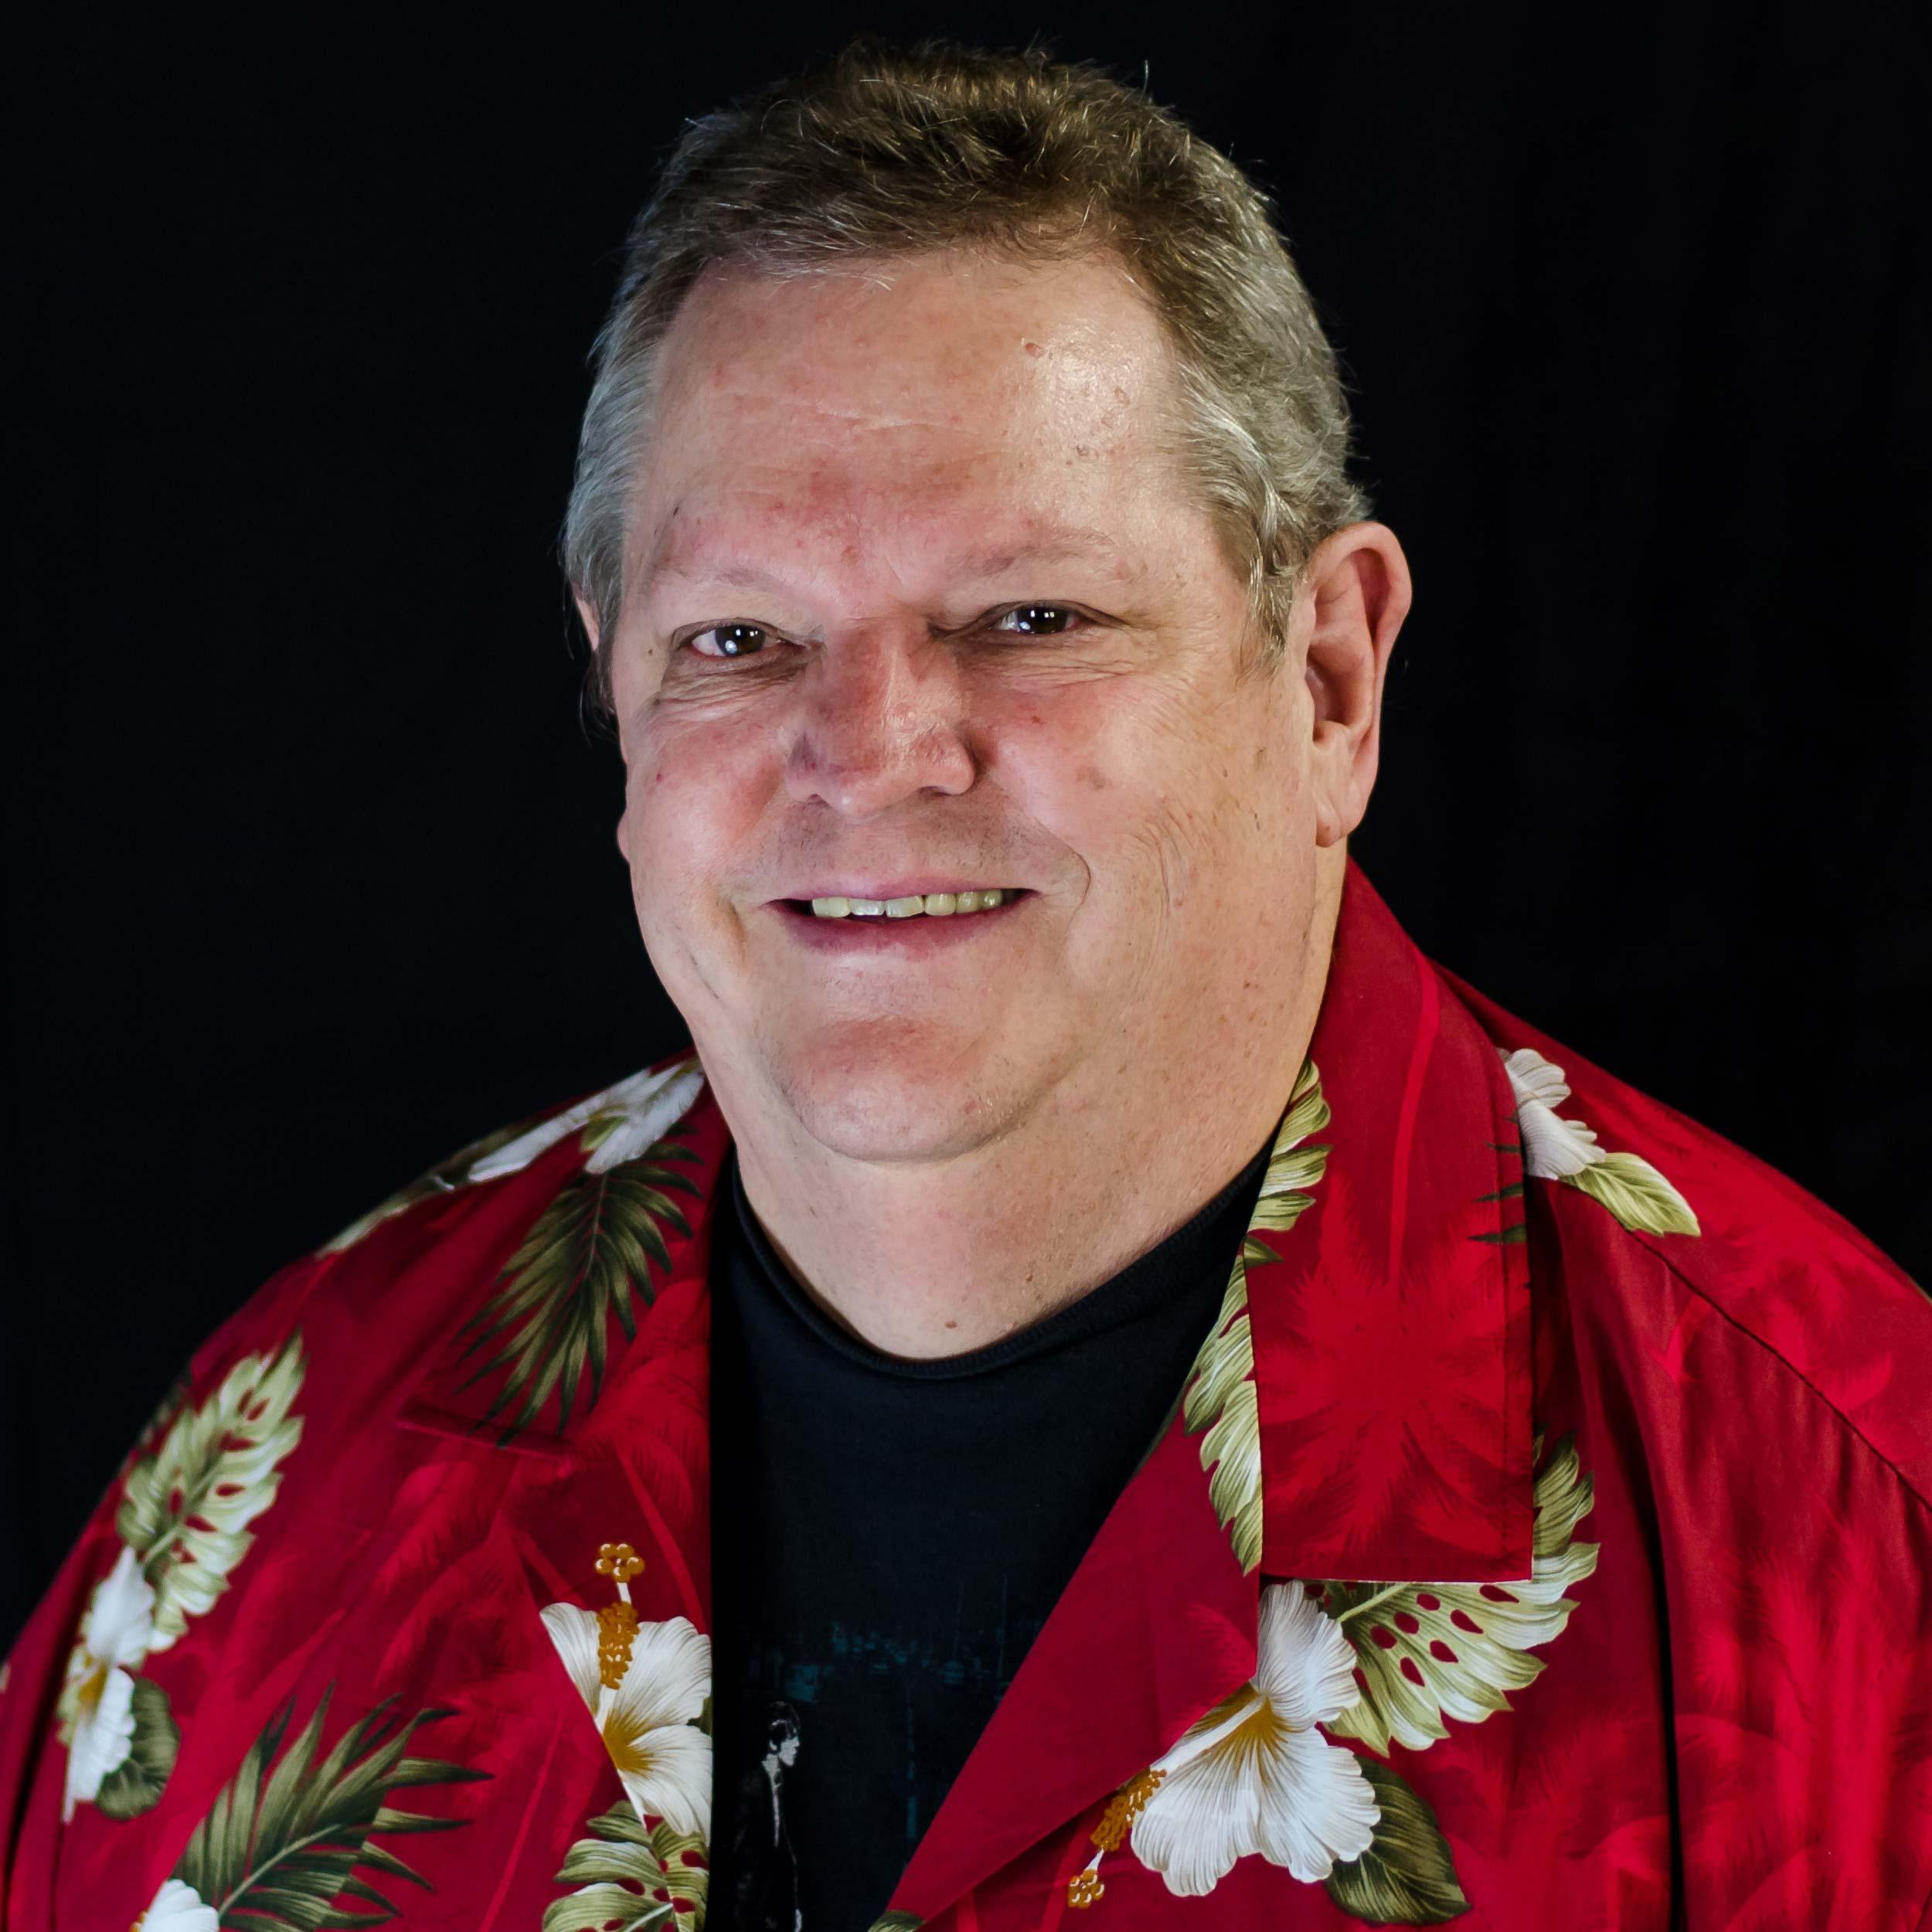 JEFF BLACKWELL technical director, panelist